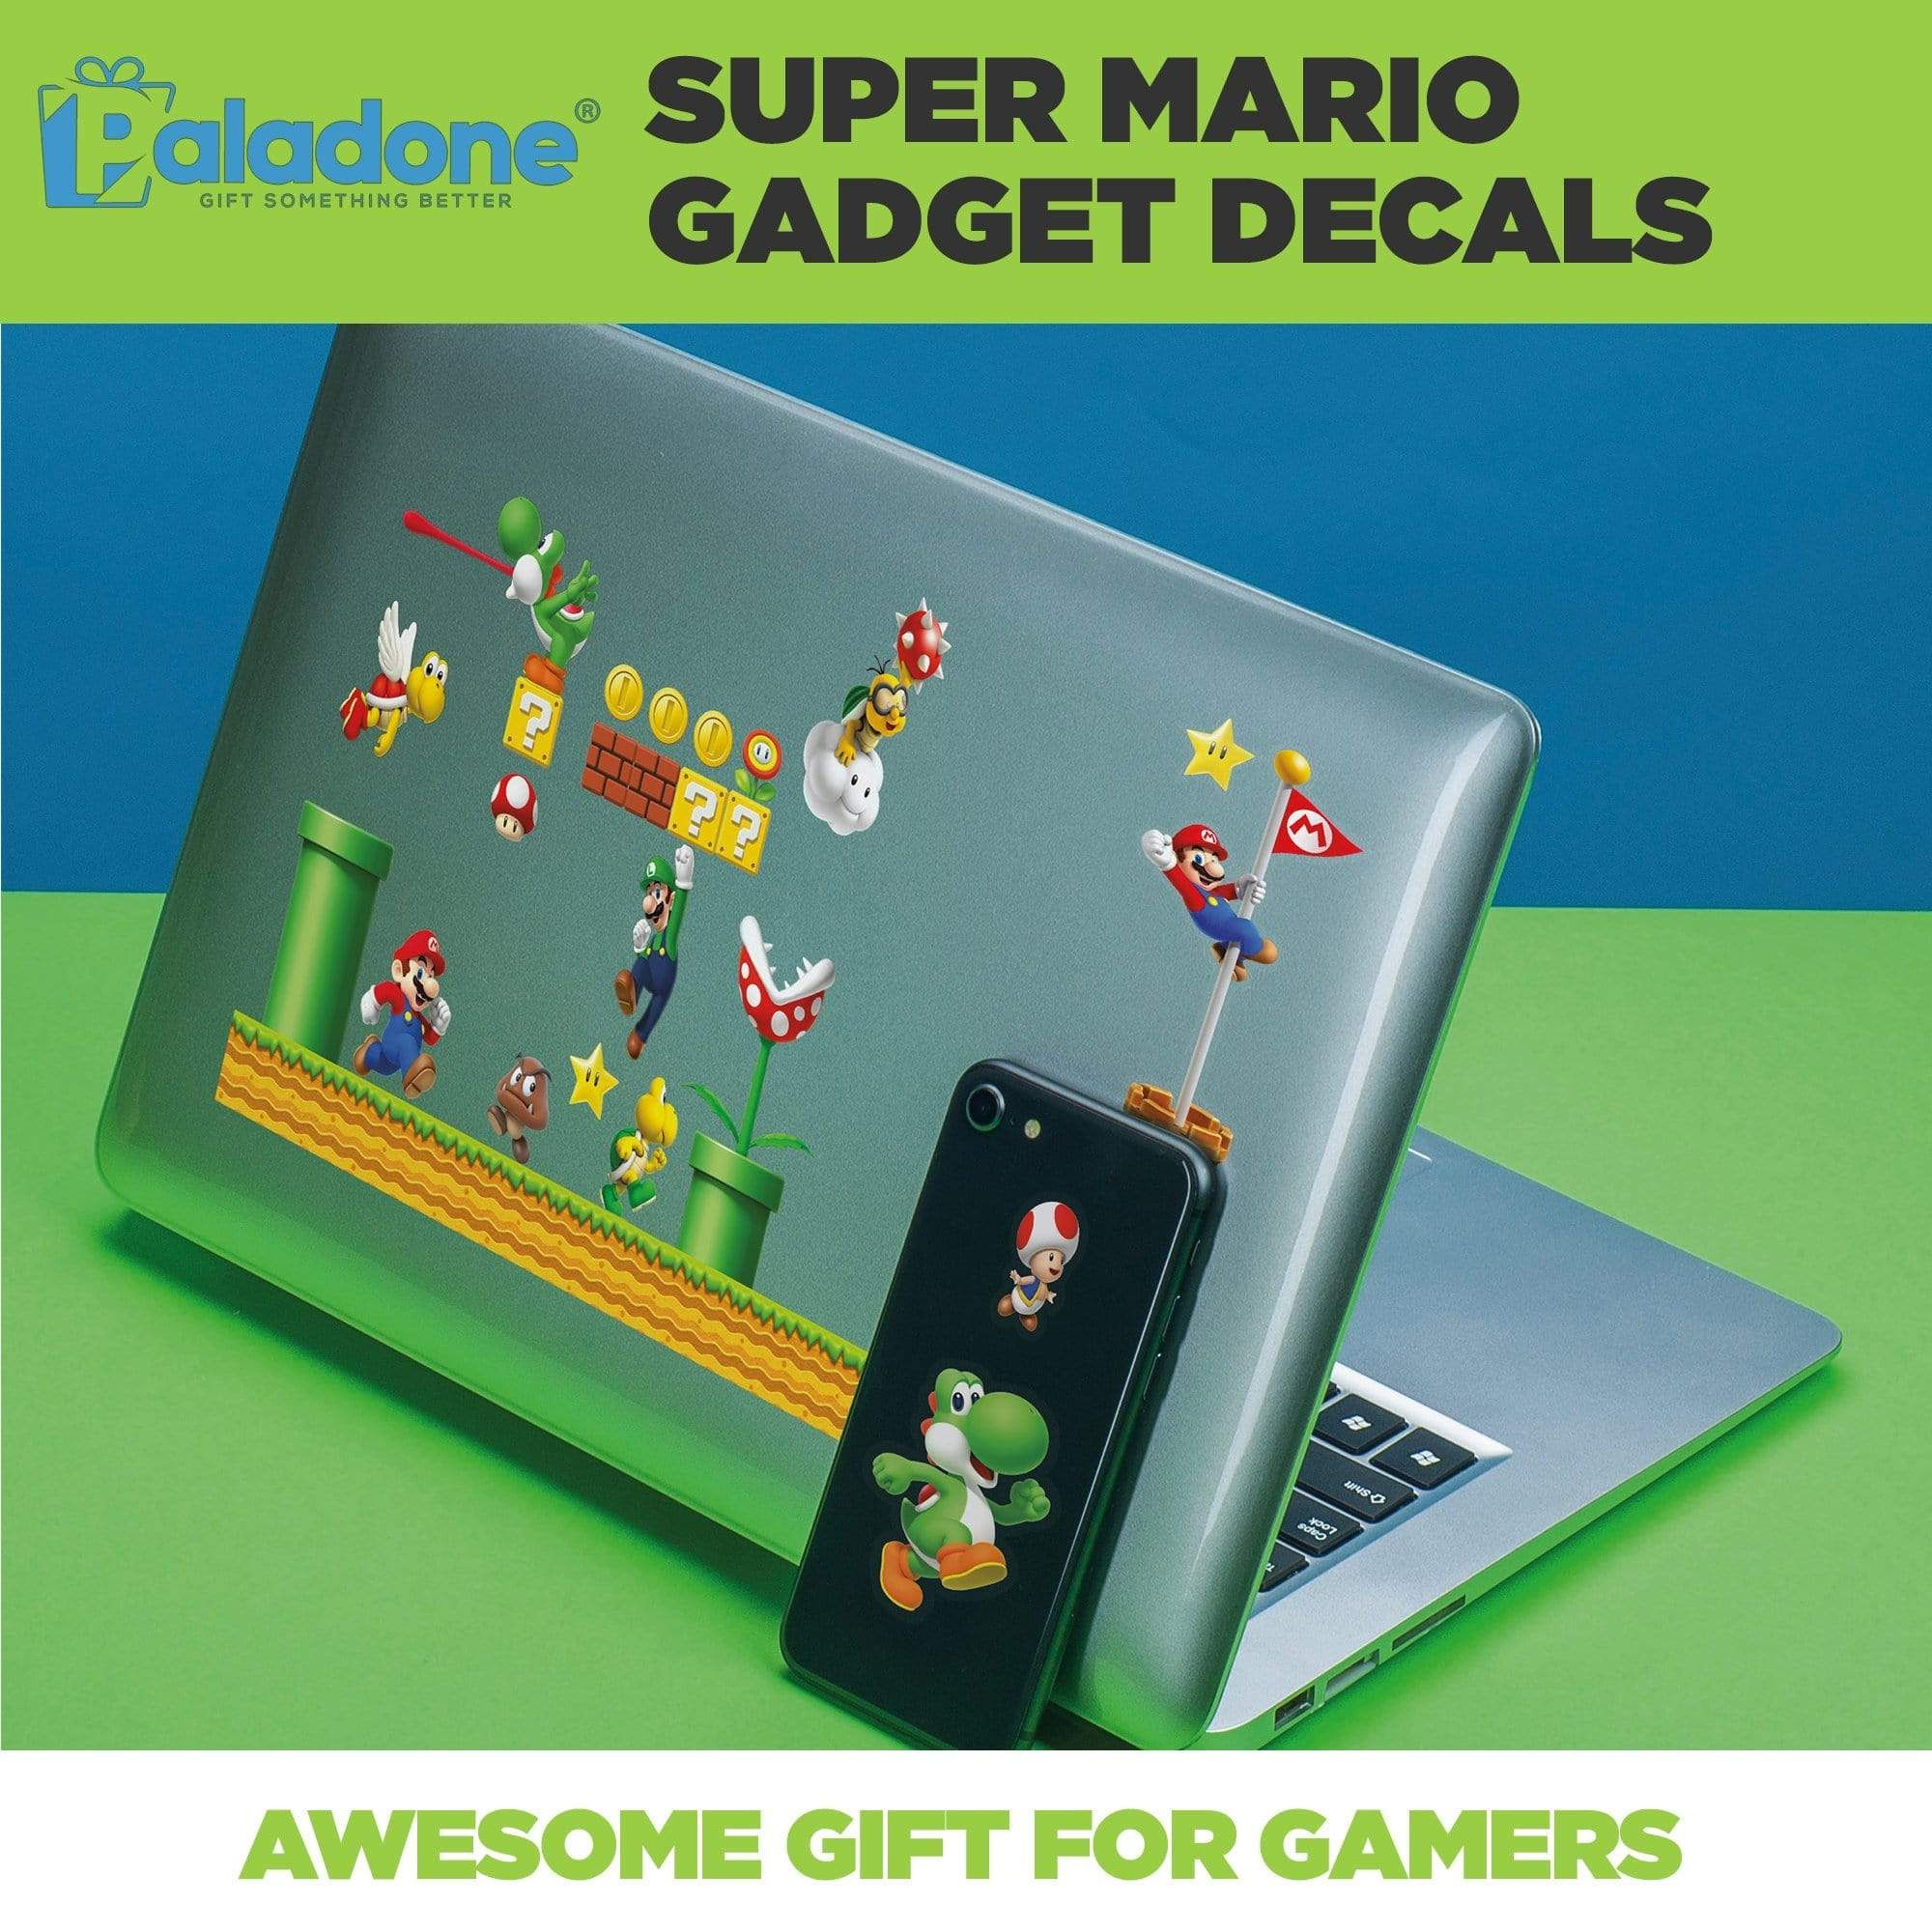 Paladone | Super Mario Gadget Decals